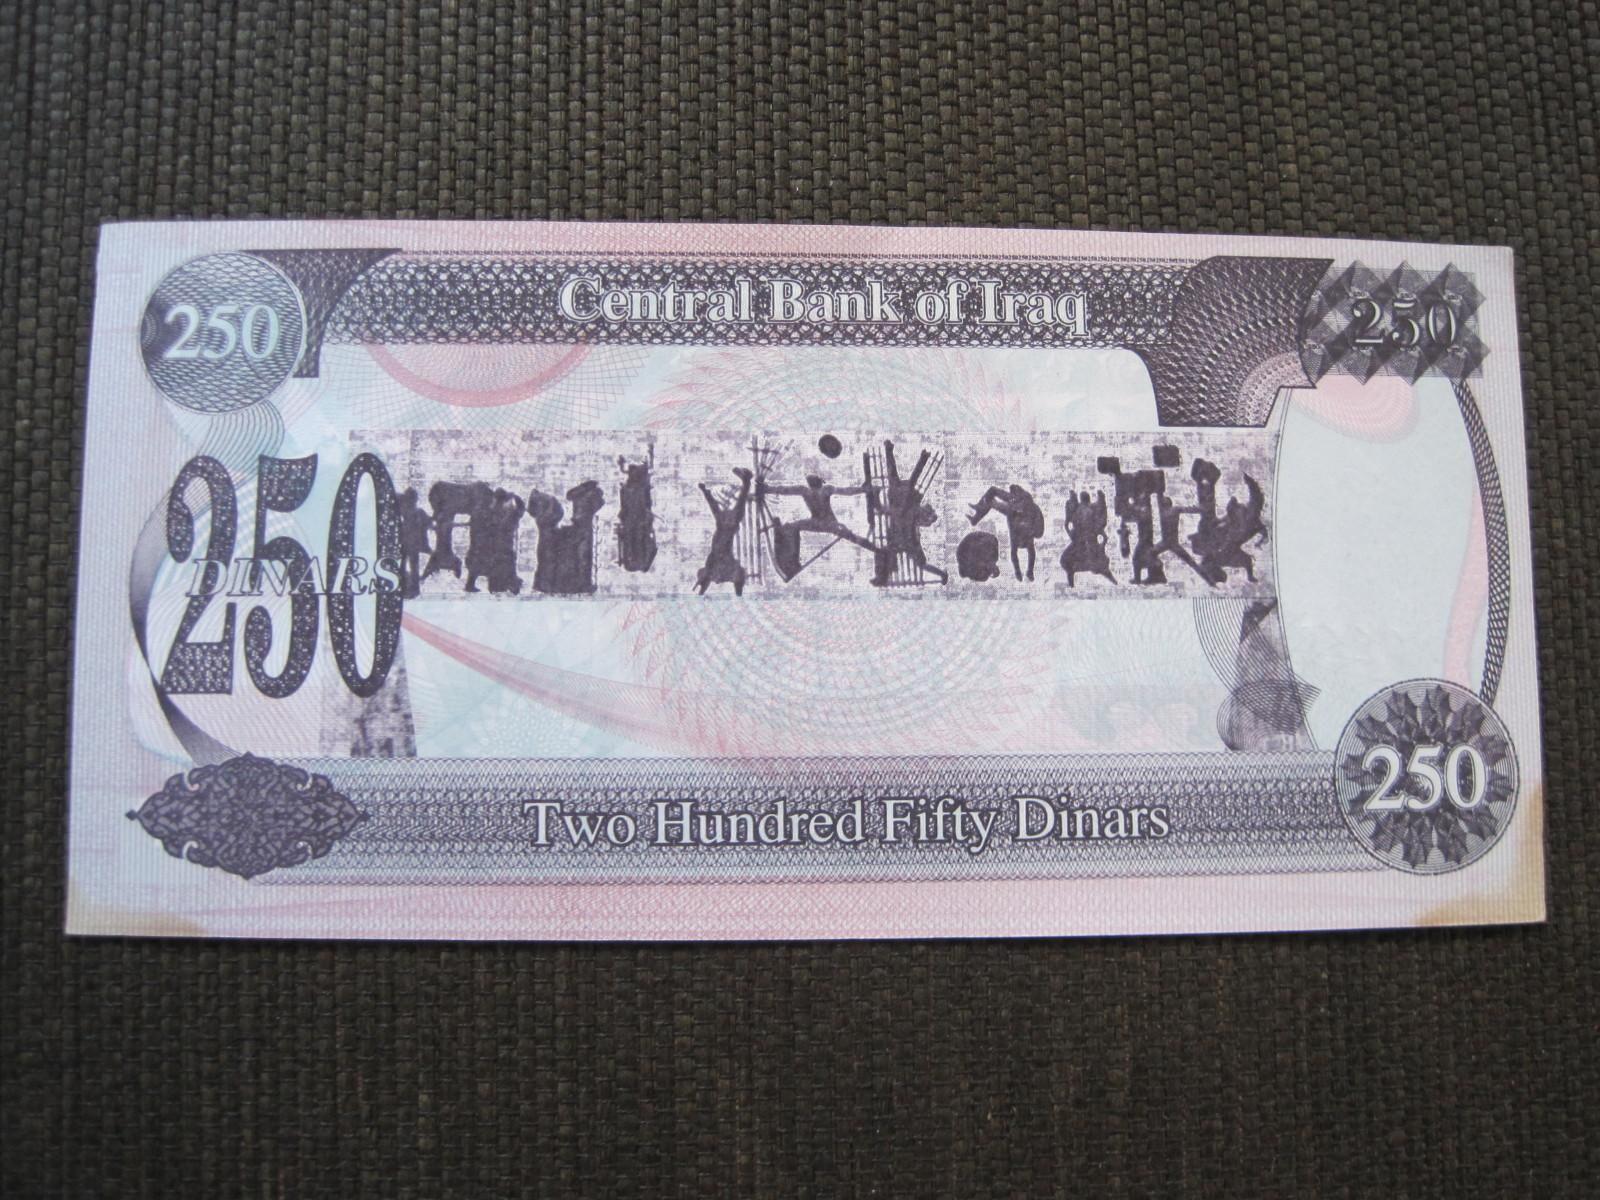 250 Dinares Iraq, 1995 (Sadam Husein), Es un billete autentico¿? 14mxmww